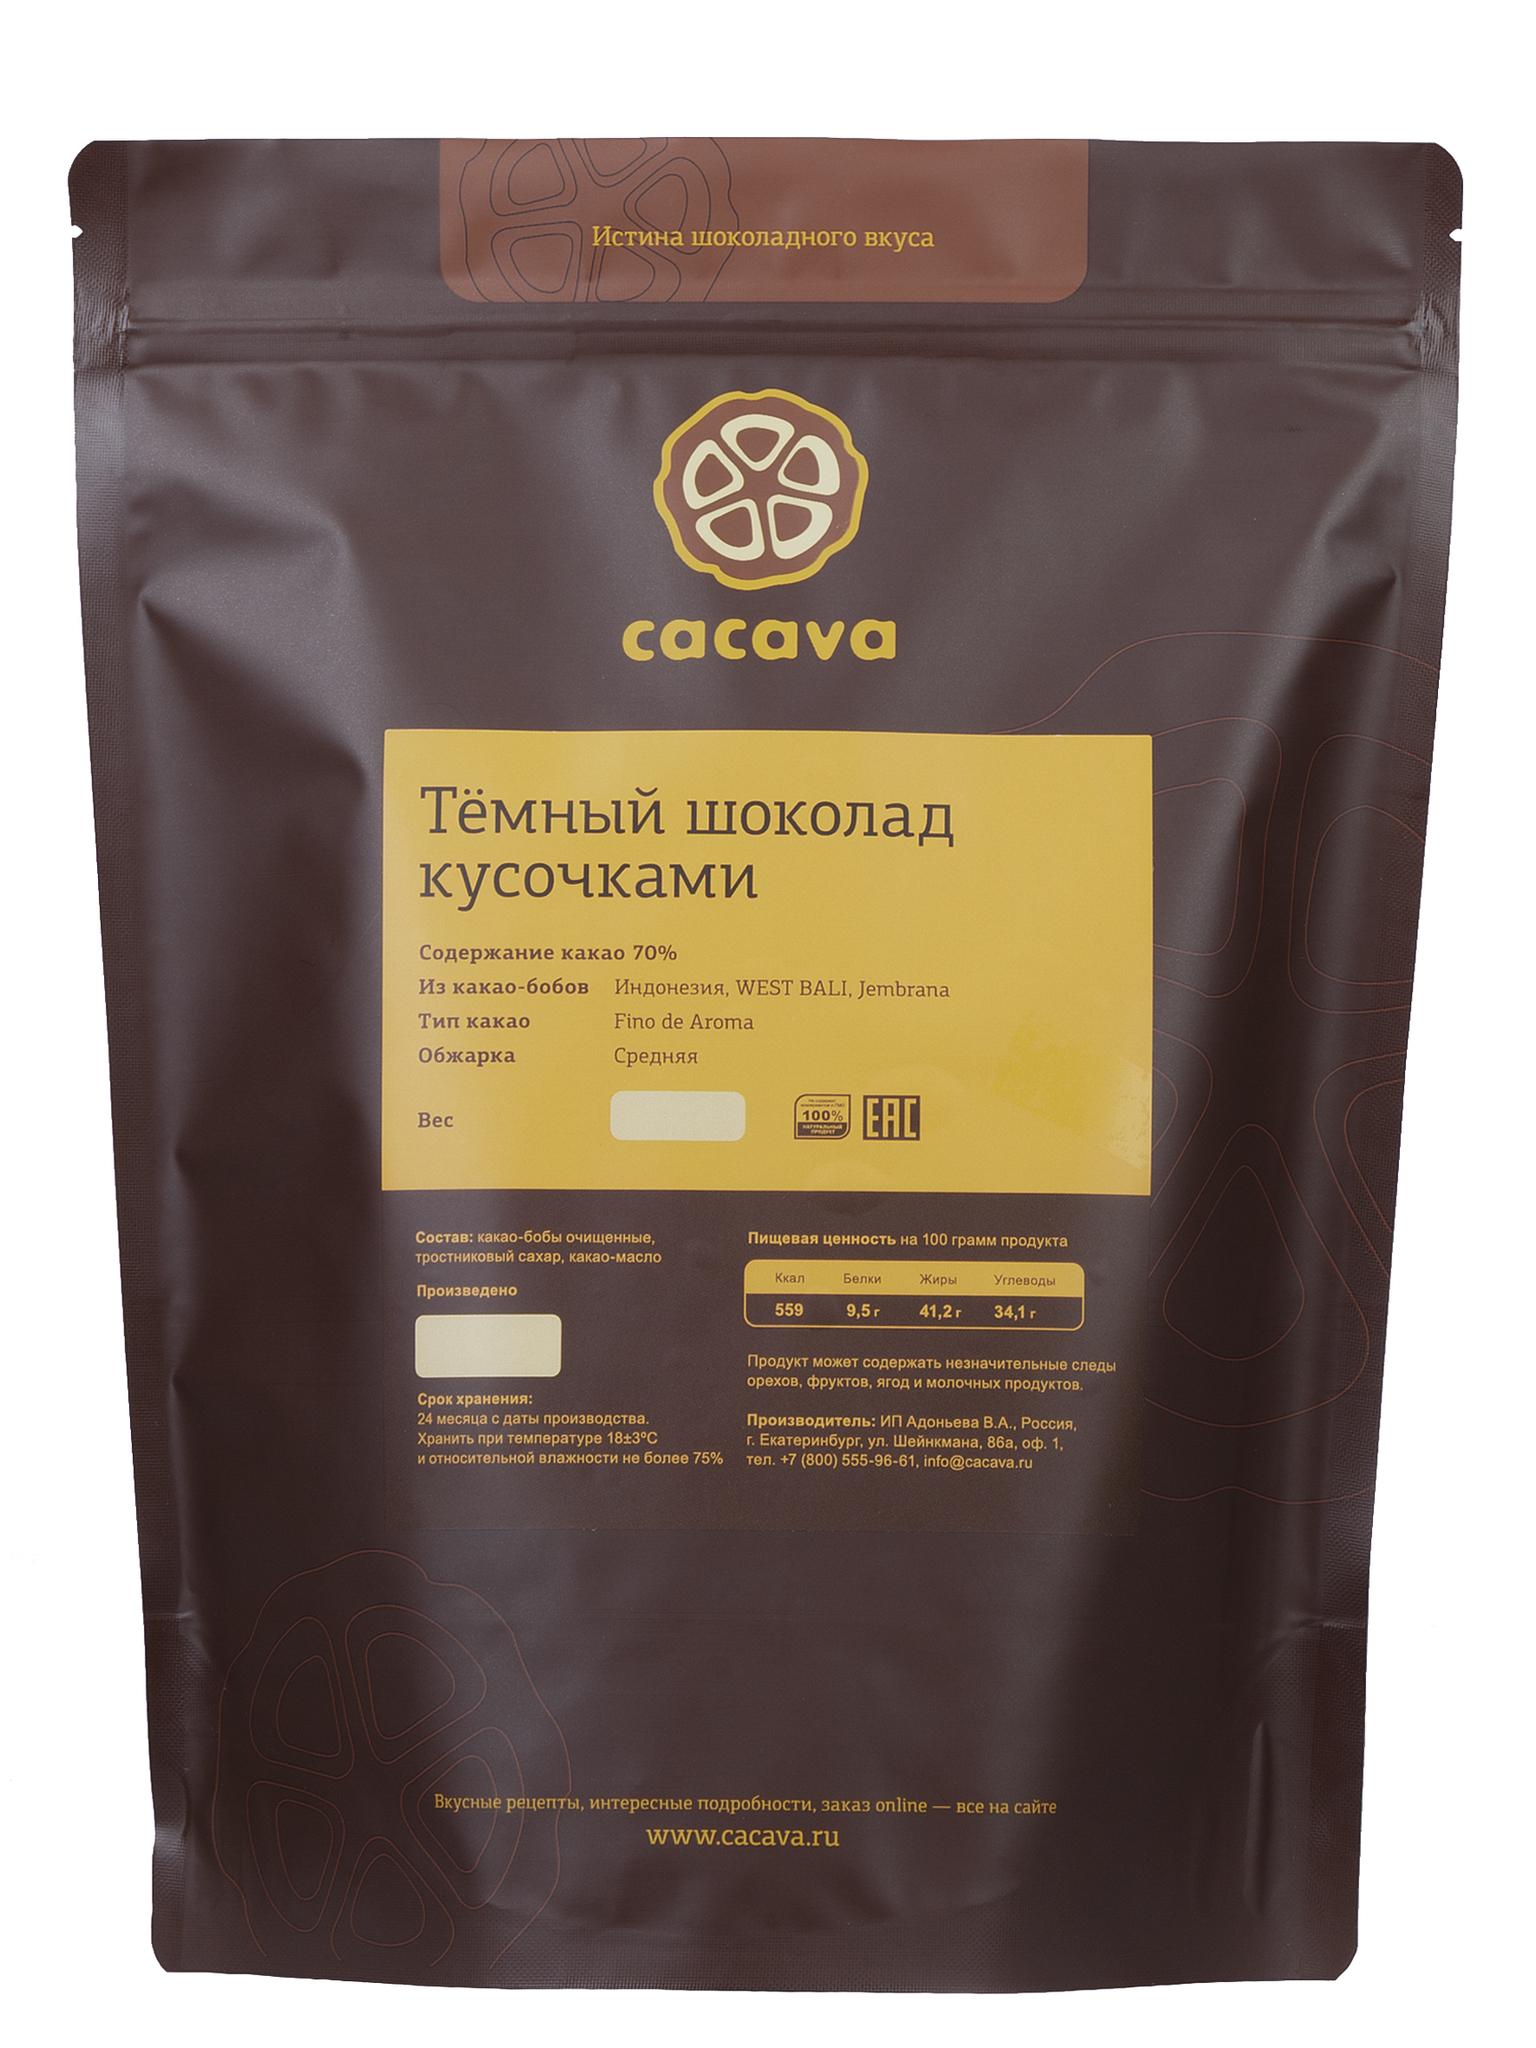 Тёмный шоколад 70 % какао (Индонезия, WEST BALI, Jembrana), упаковка 1 кг